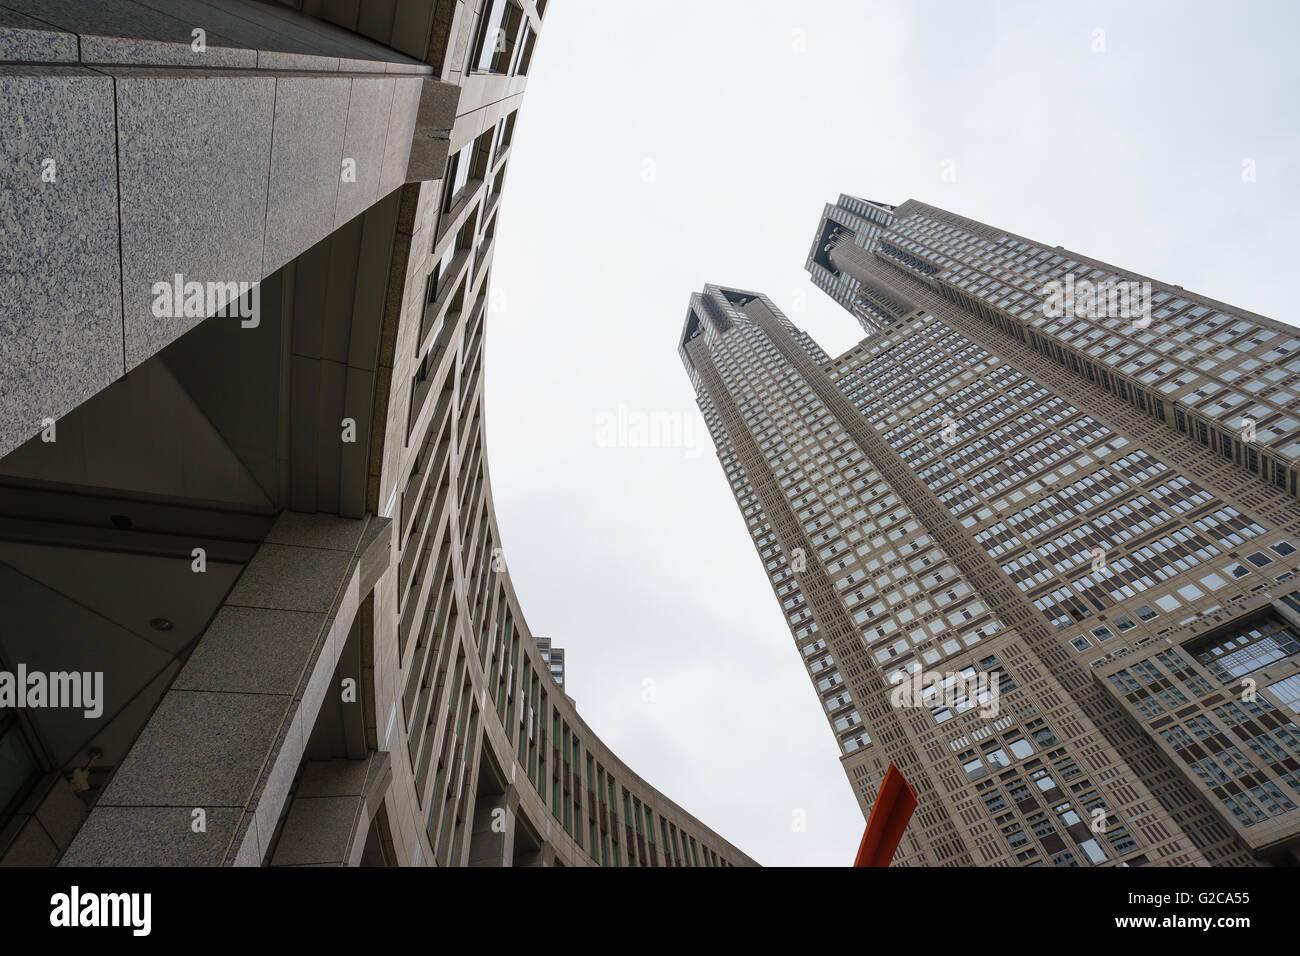 La ville de Tokyo, Shinjuku, Tokyo, Japon. Photo Stock